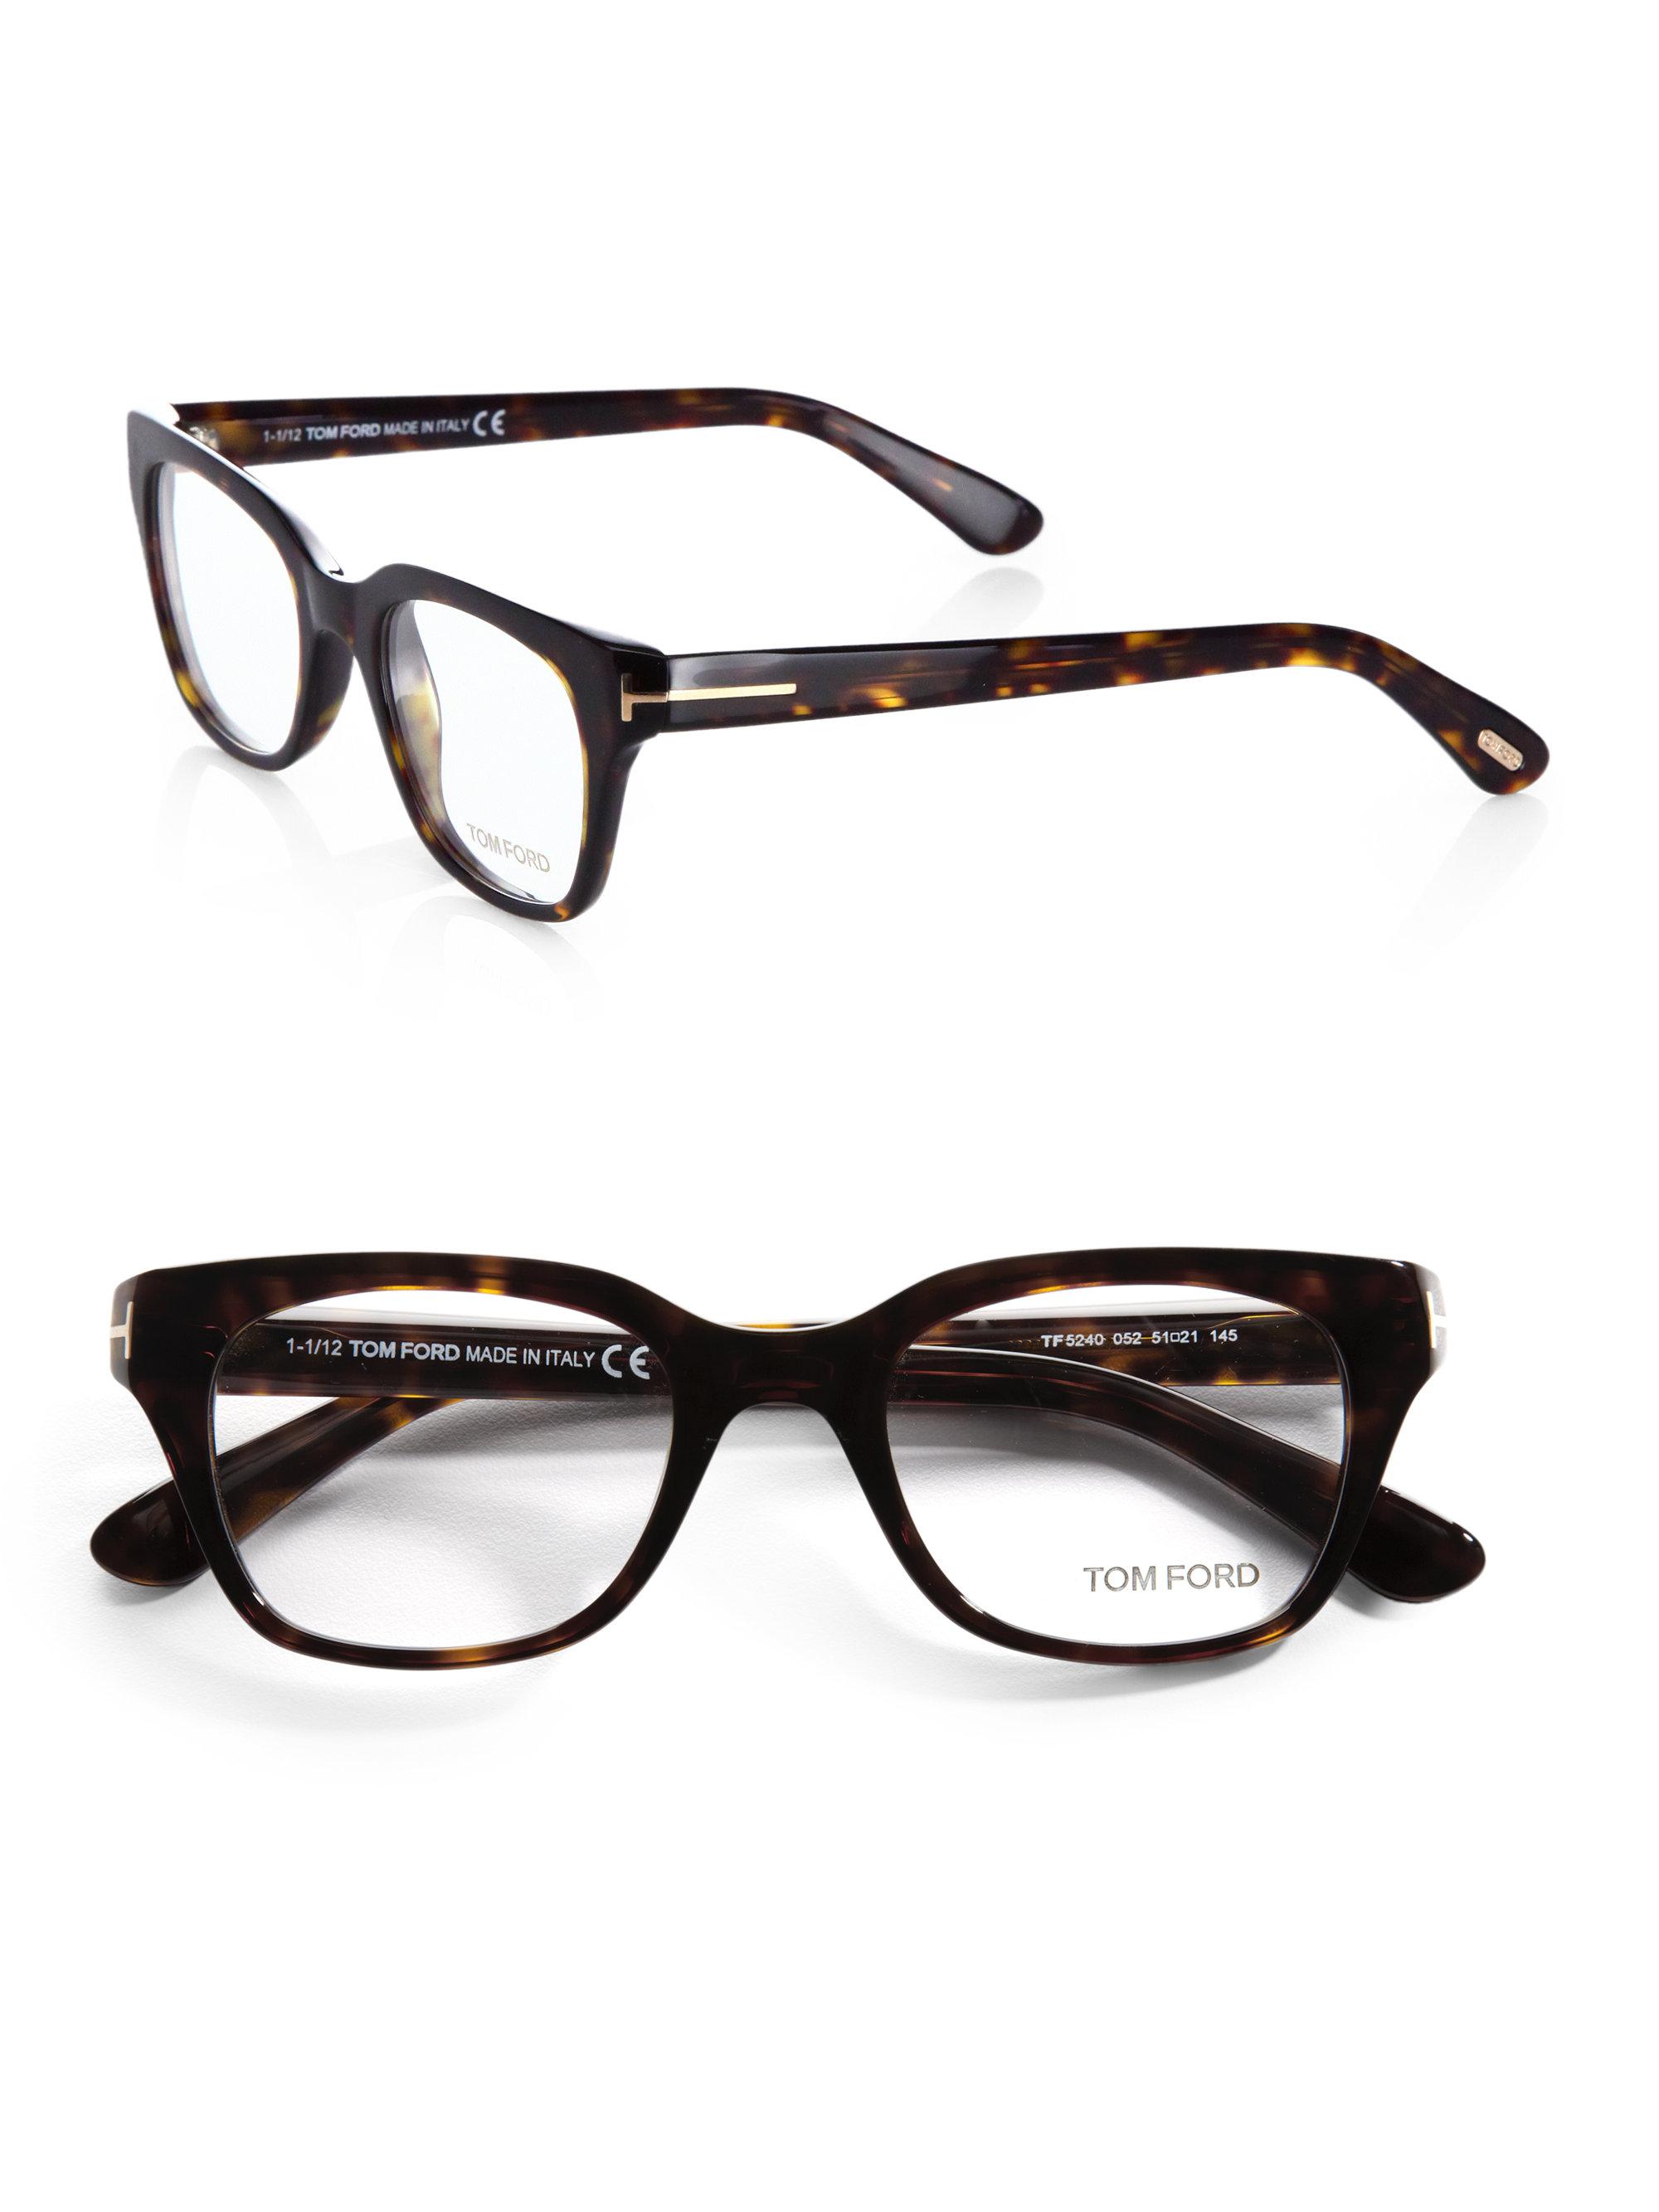 Tom Ford 5240 Square Optical Frames In Brown For Men Lyst